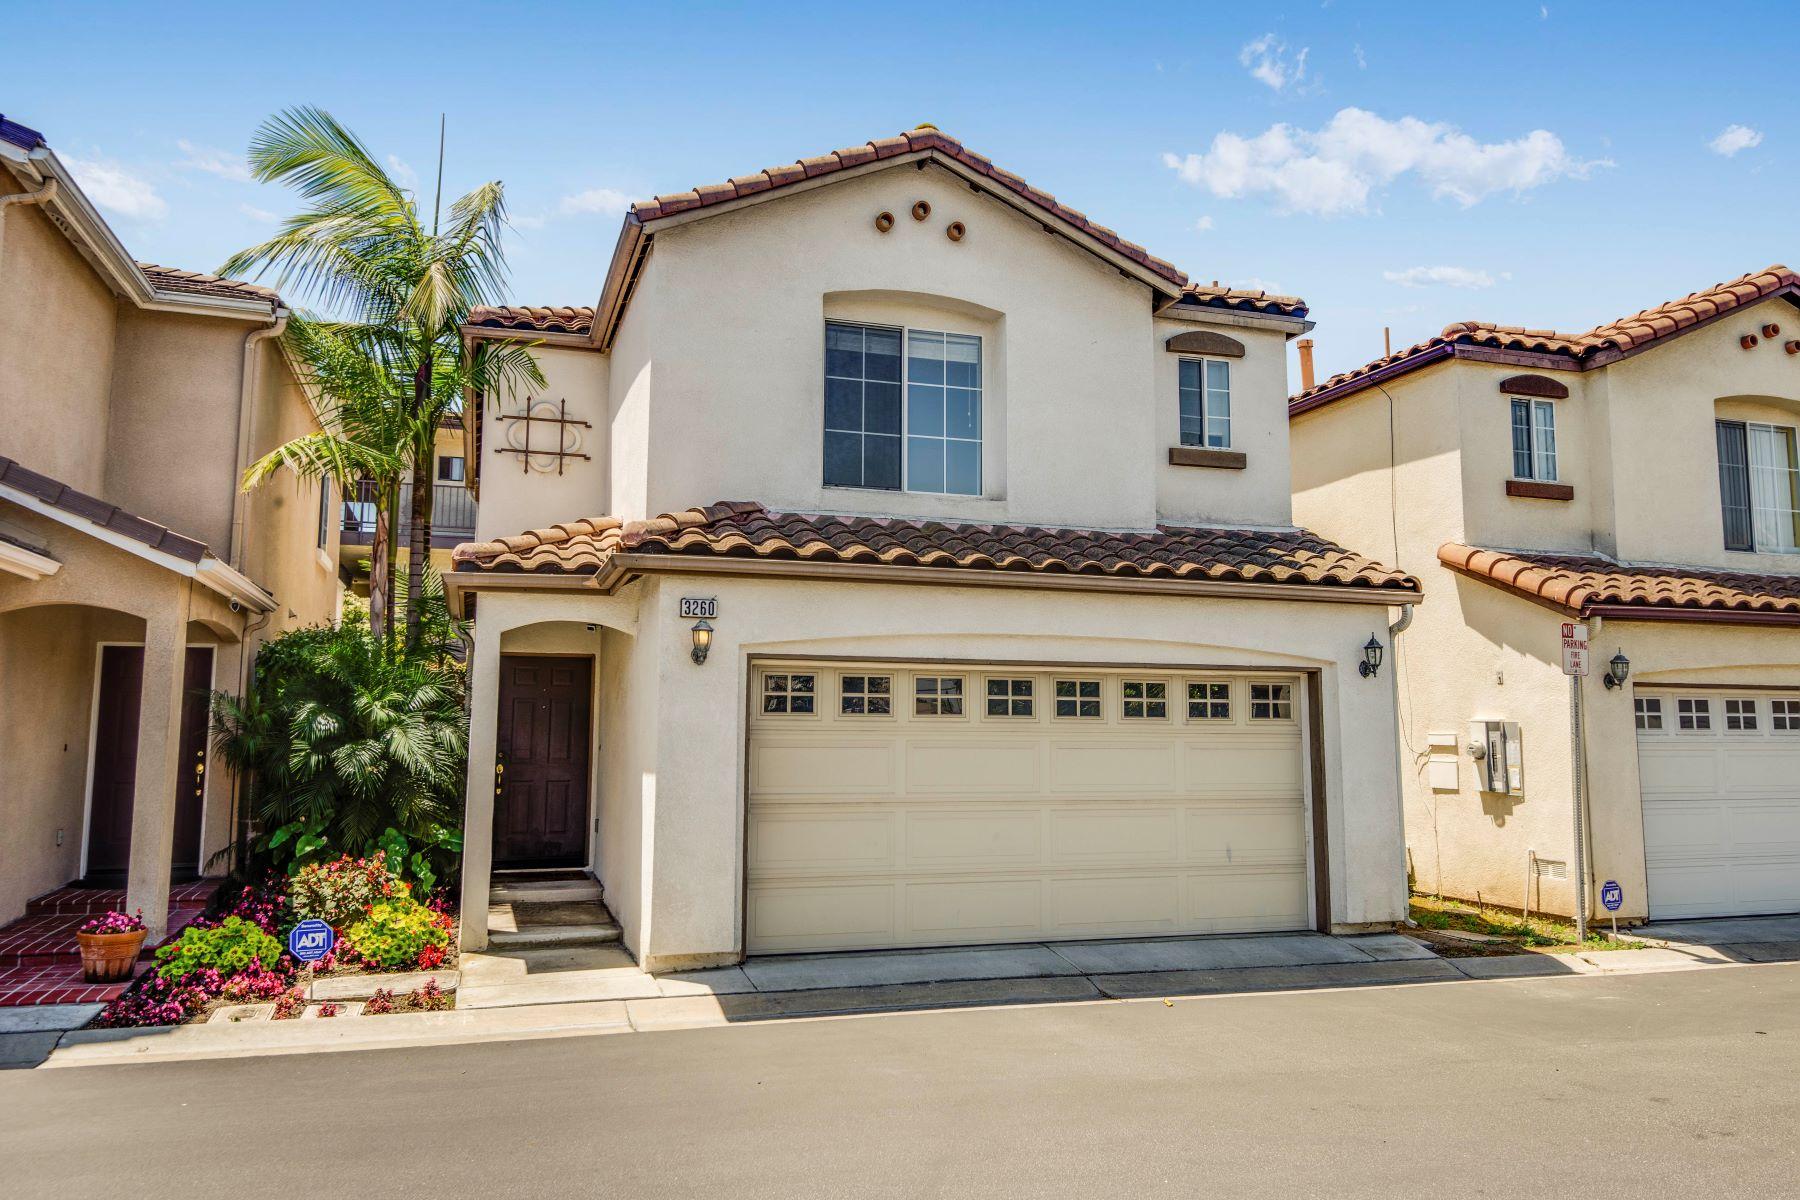 Single Family Homes for Sale at 3260 Park Lane, Hawthorne, CA 90250 3260 Park Lane Hawthorne, California 90250 United States